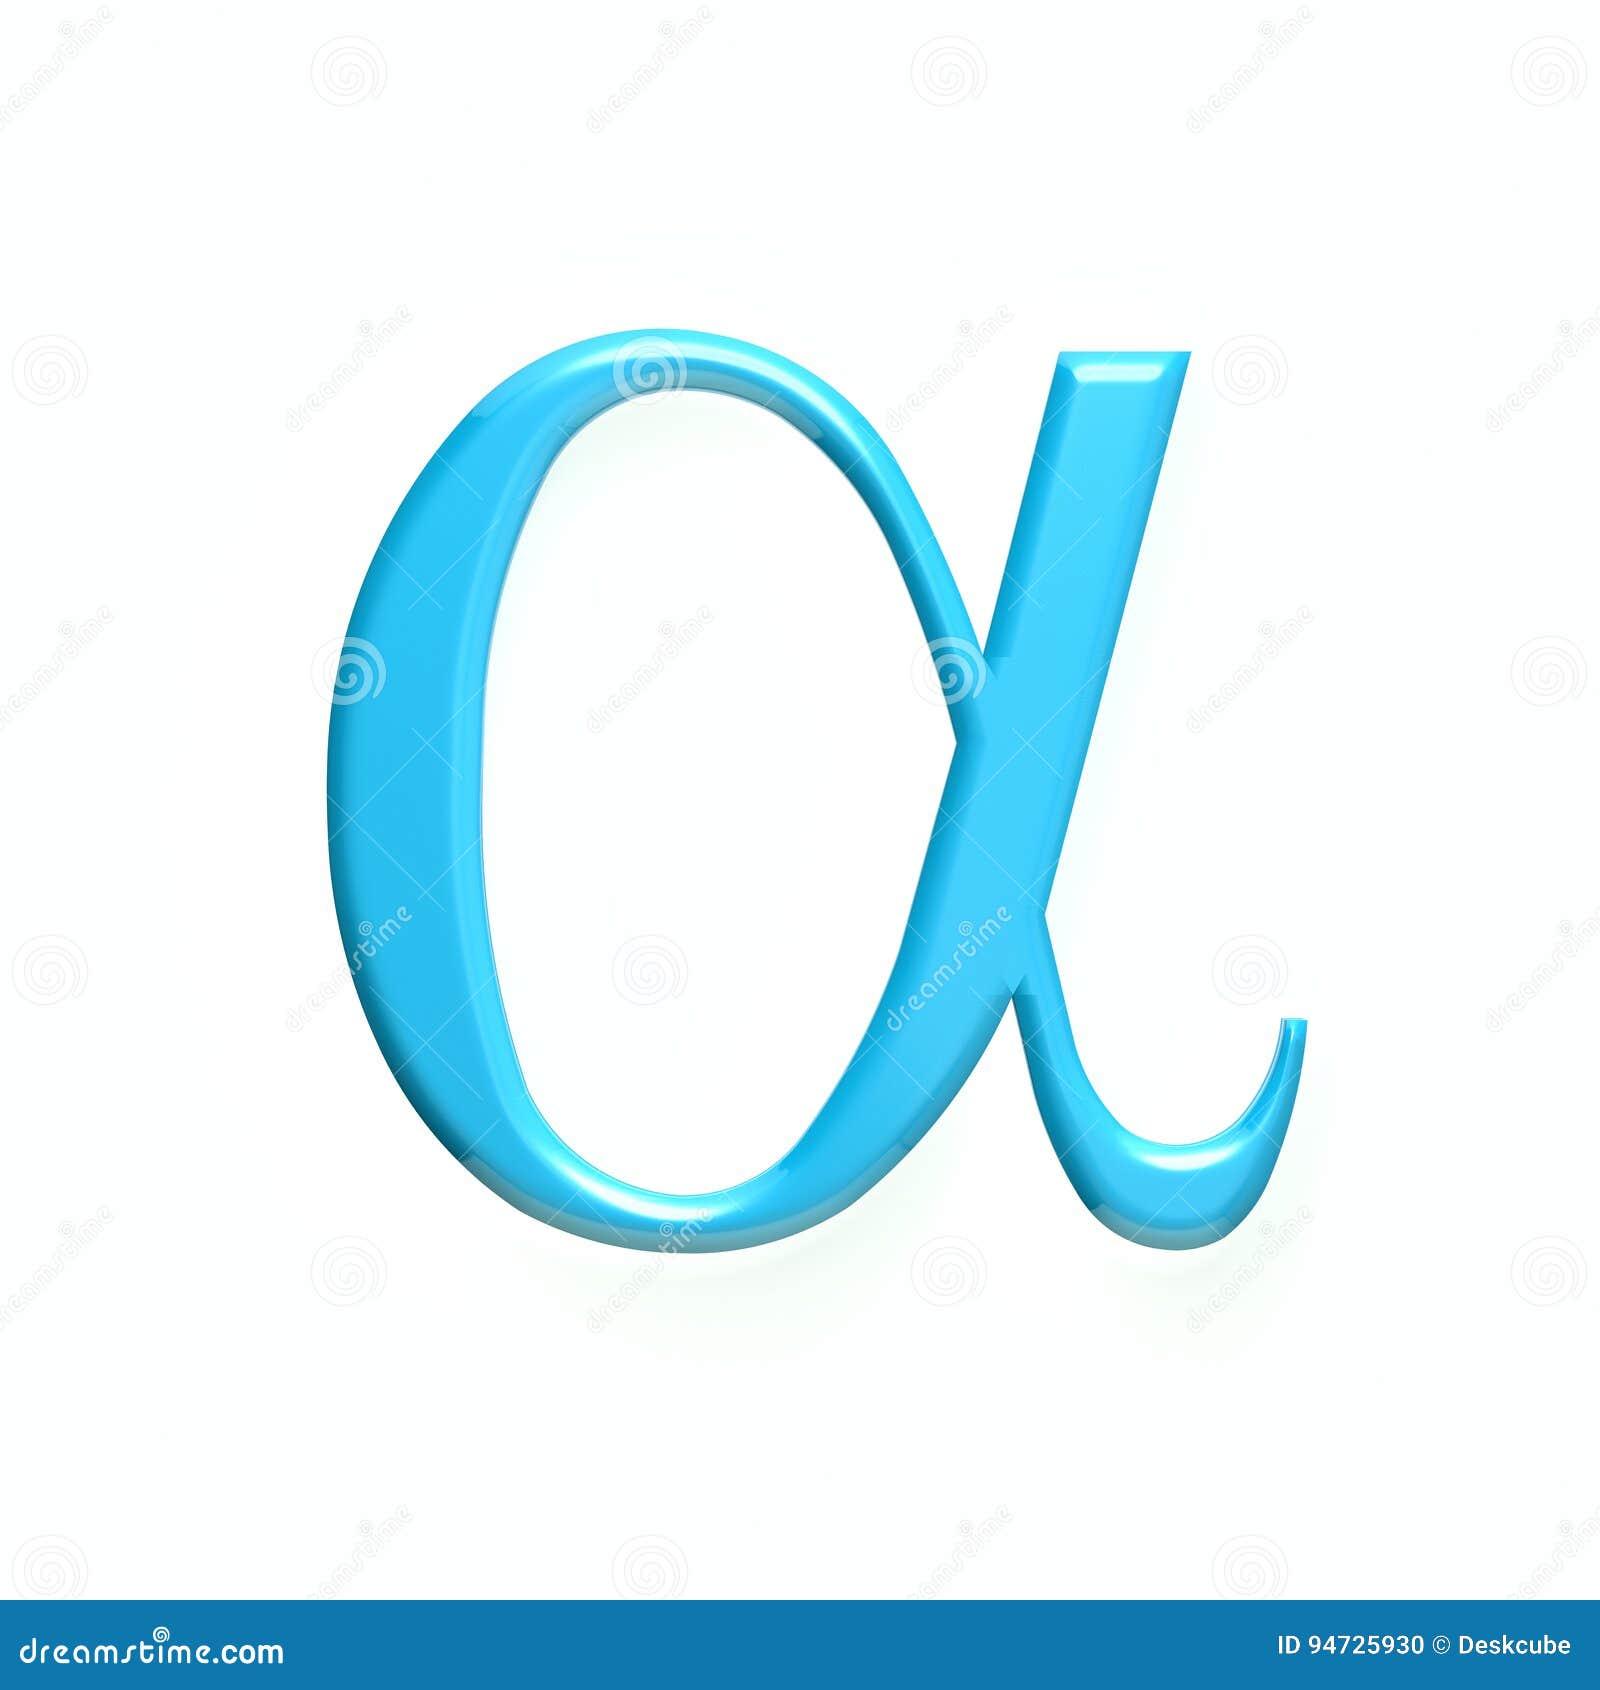 Alpha Mathematical Symbol 3d Rendering Illustration Stock